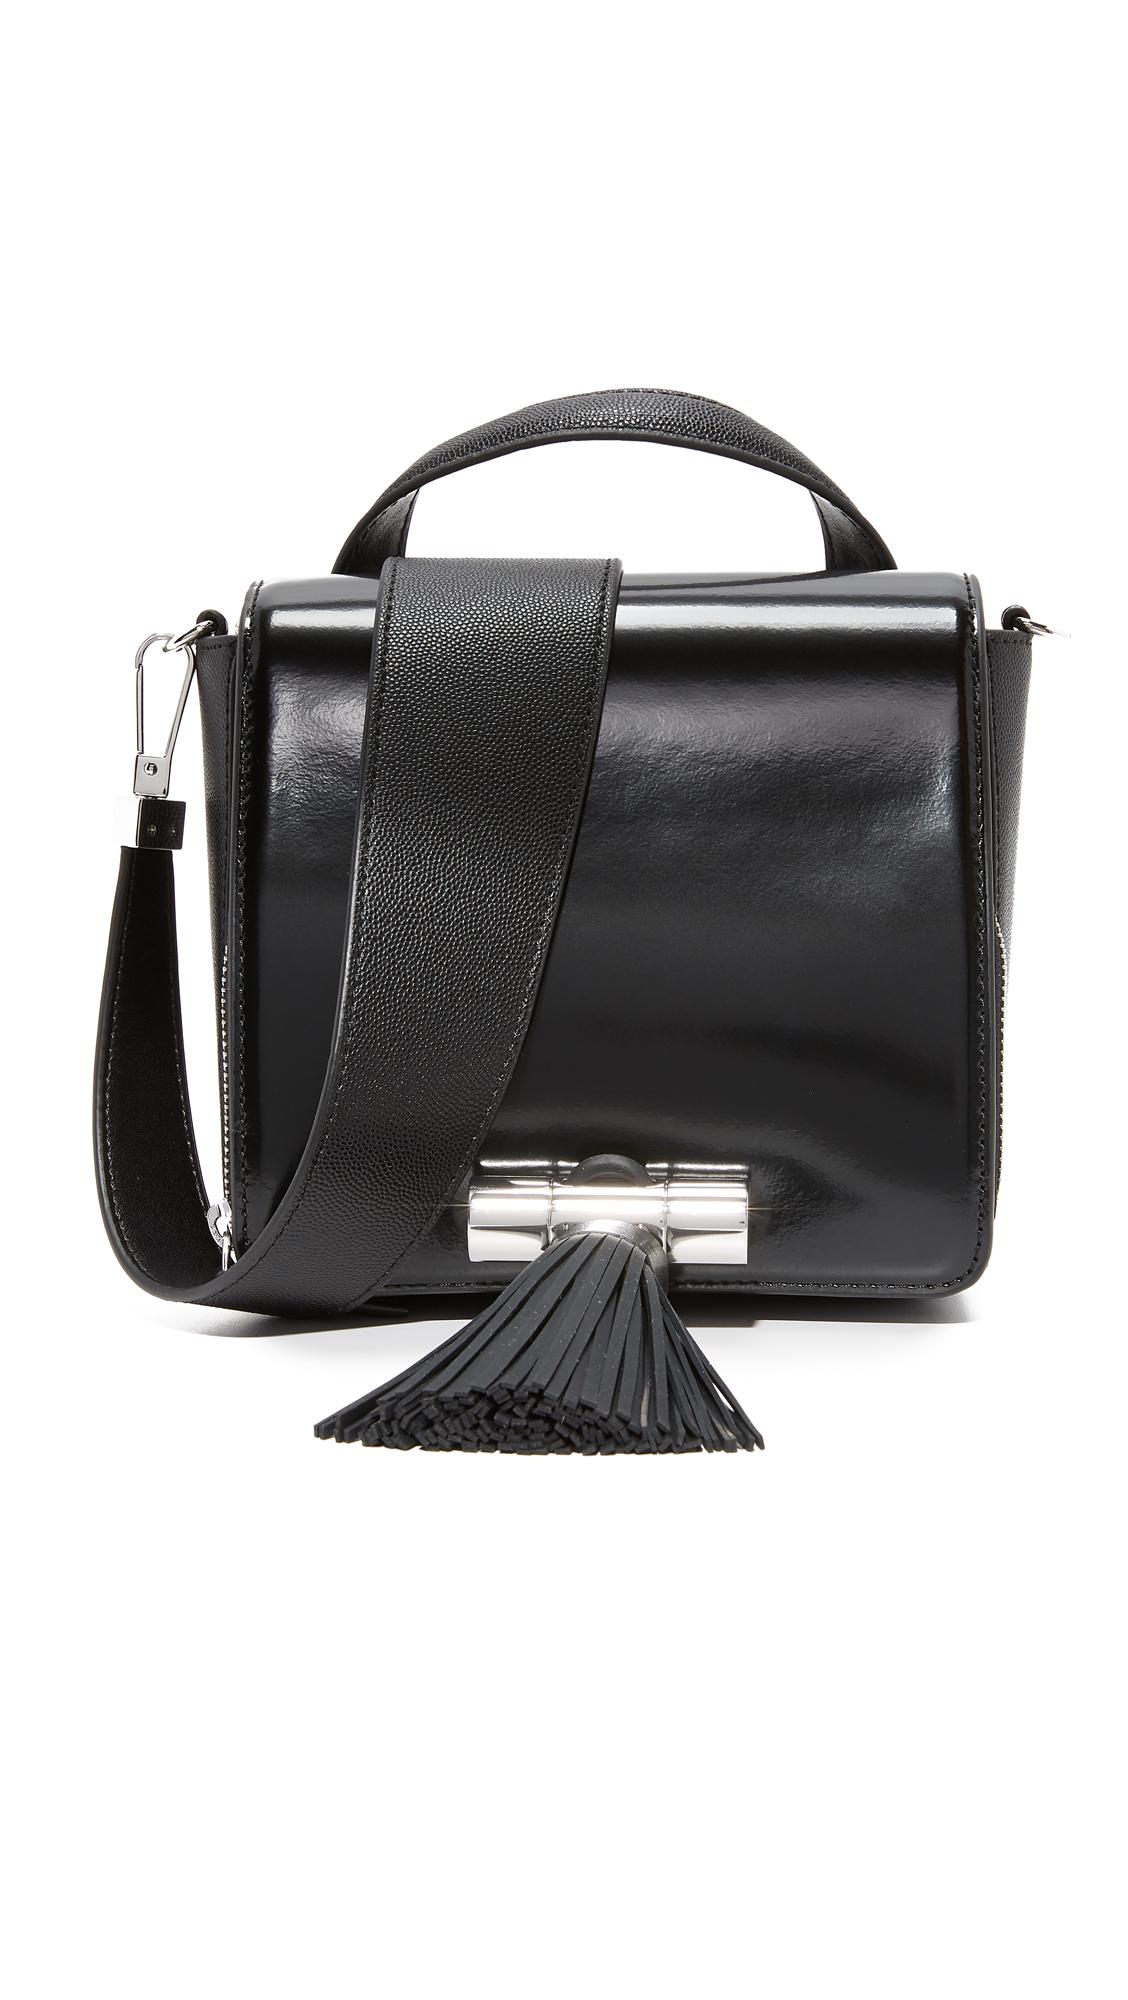 KENZO Mini Top Handle Bag - Black